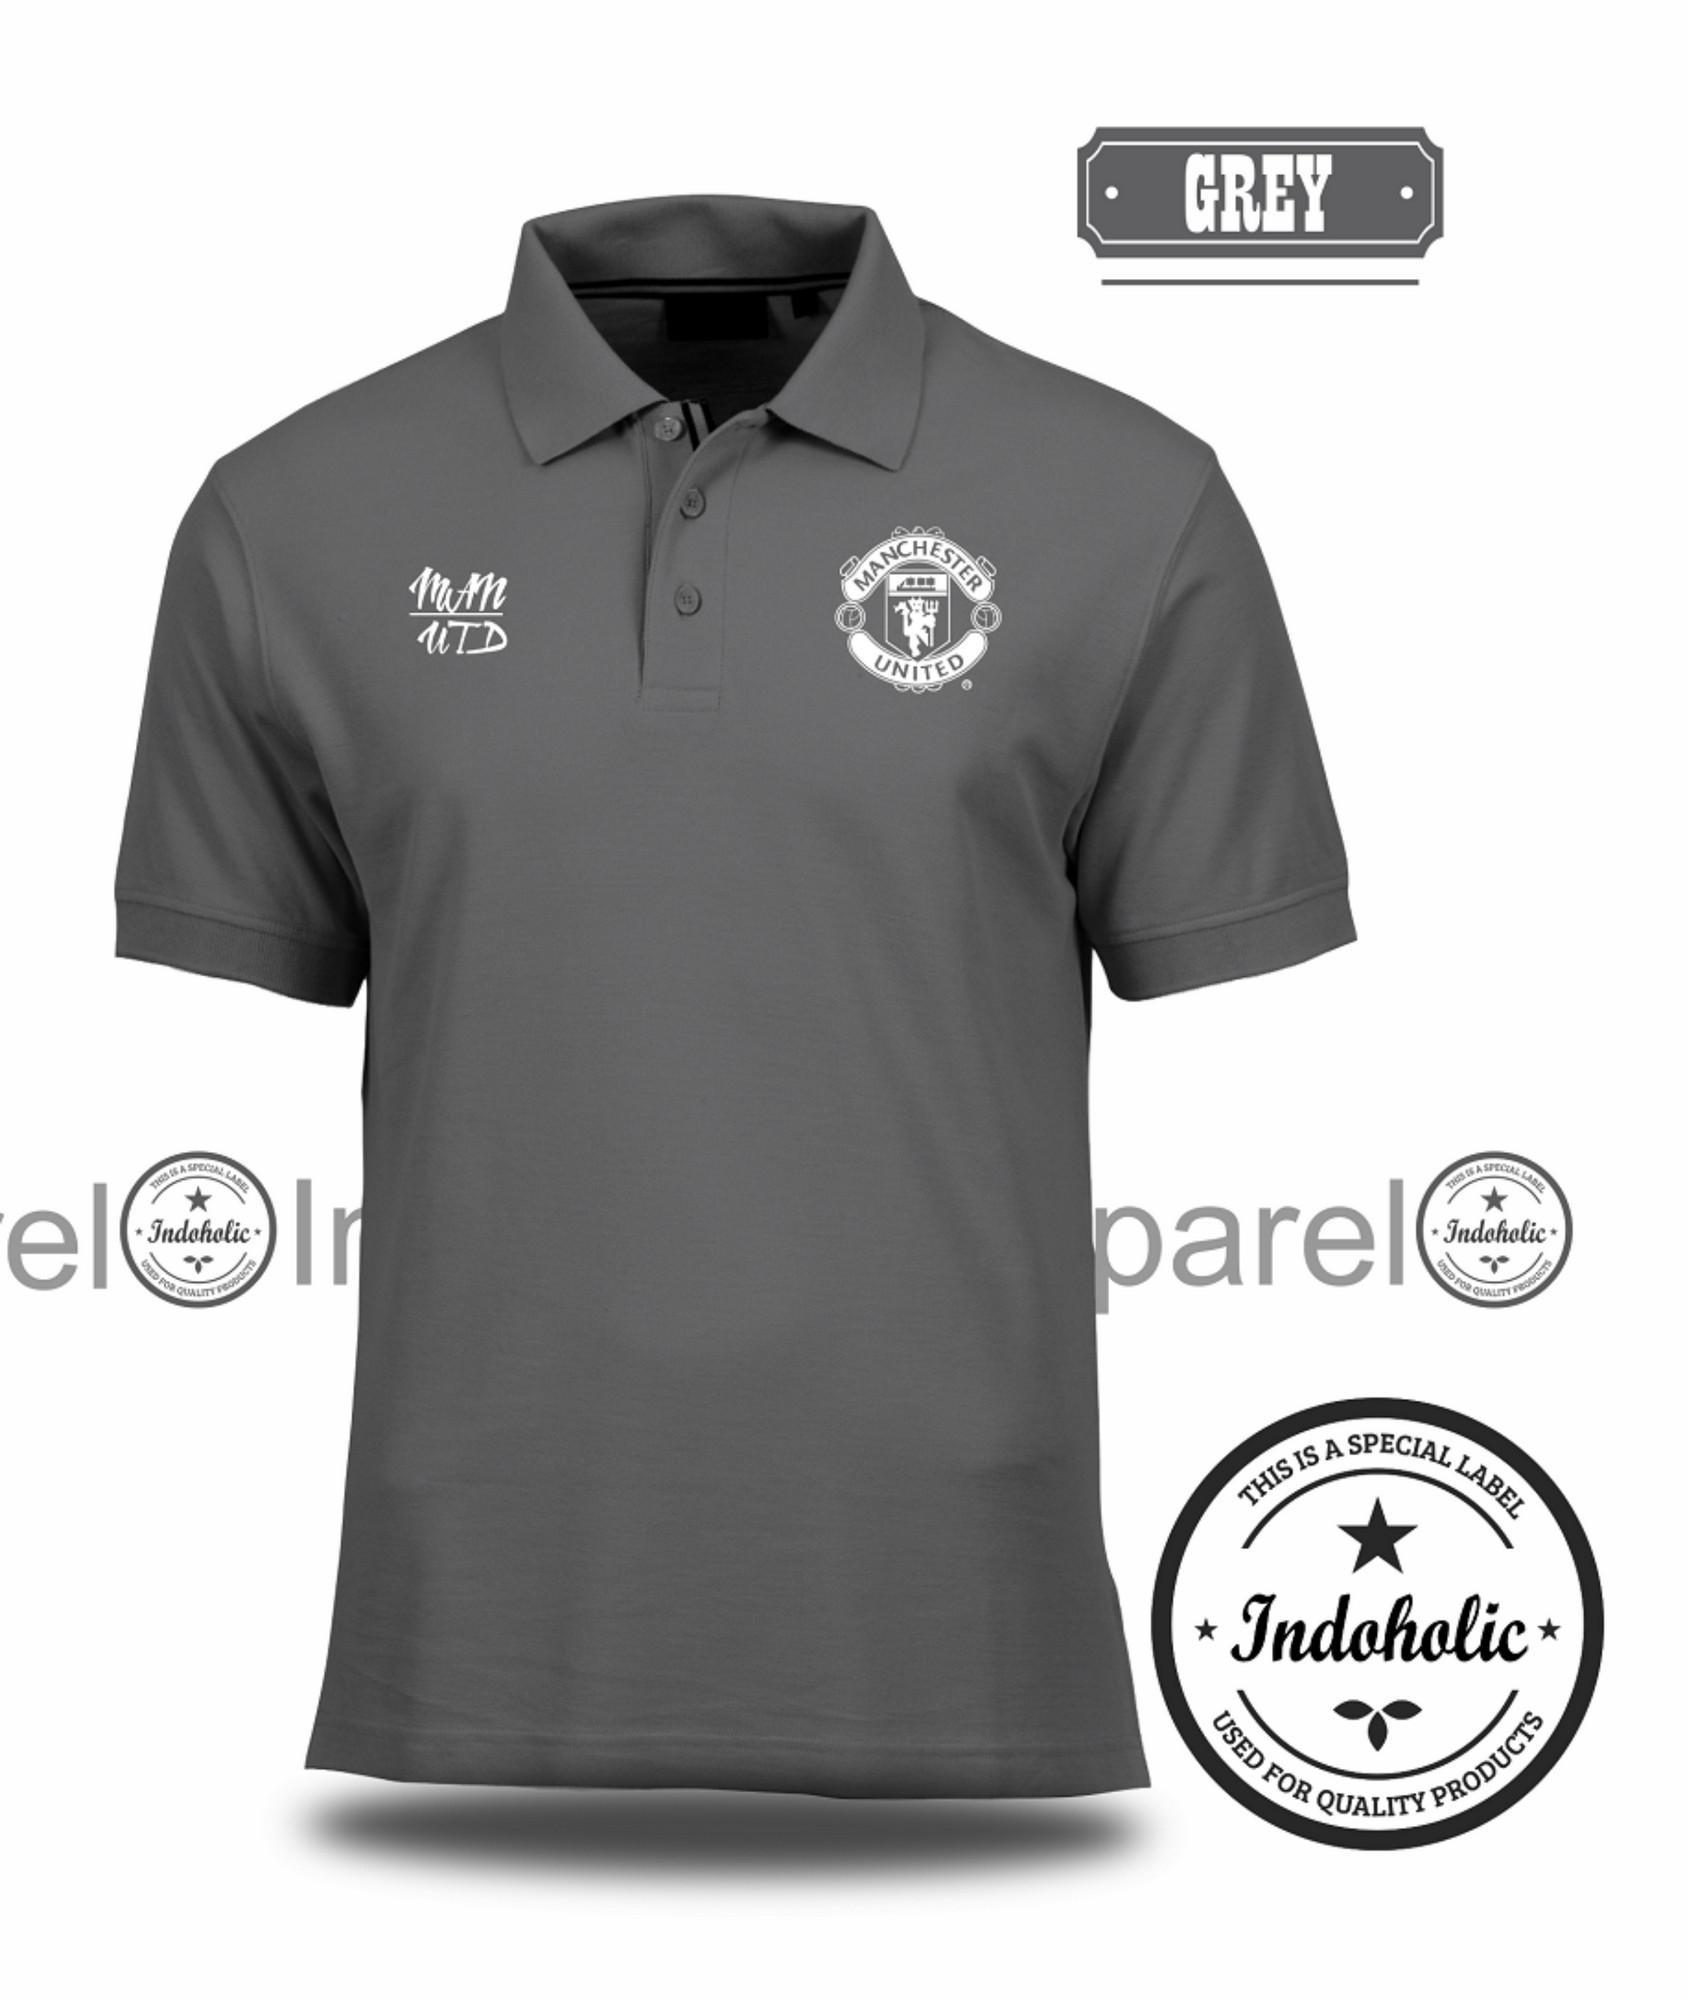 Polo Shirt Kaos Distro Football Club Klub Sepak Bola Liga Inggris Manchester United MU T-Shirt Fashion Pria Wanita Cowok Cewek Baju T-Shirt Jakarta Bandung Terbaru Jaman Now Kekinian Atasan Pakaian Polos Pendek Kerah Berkera